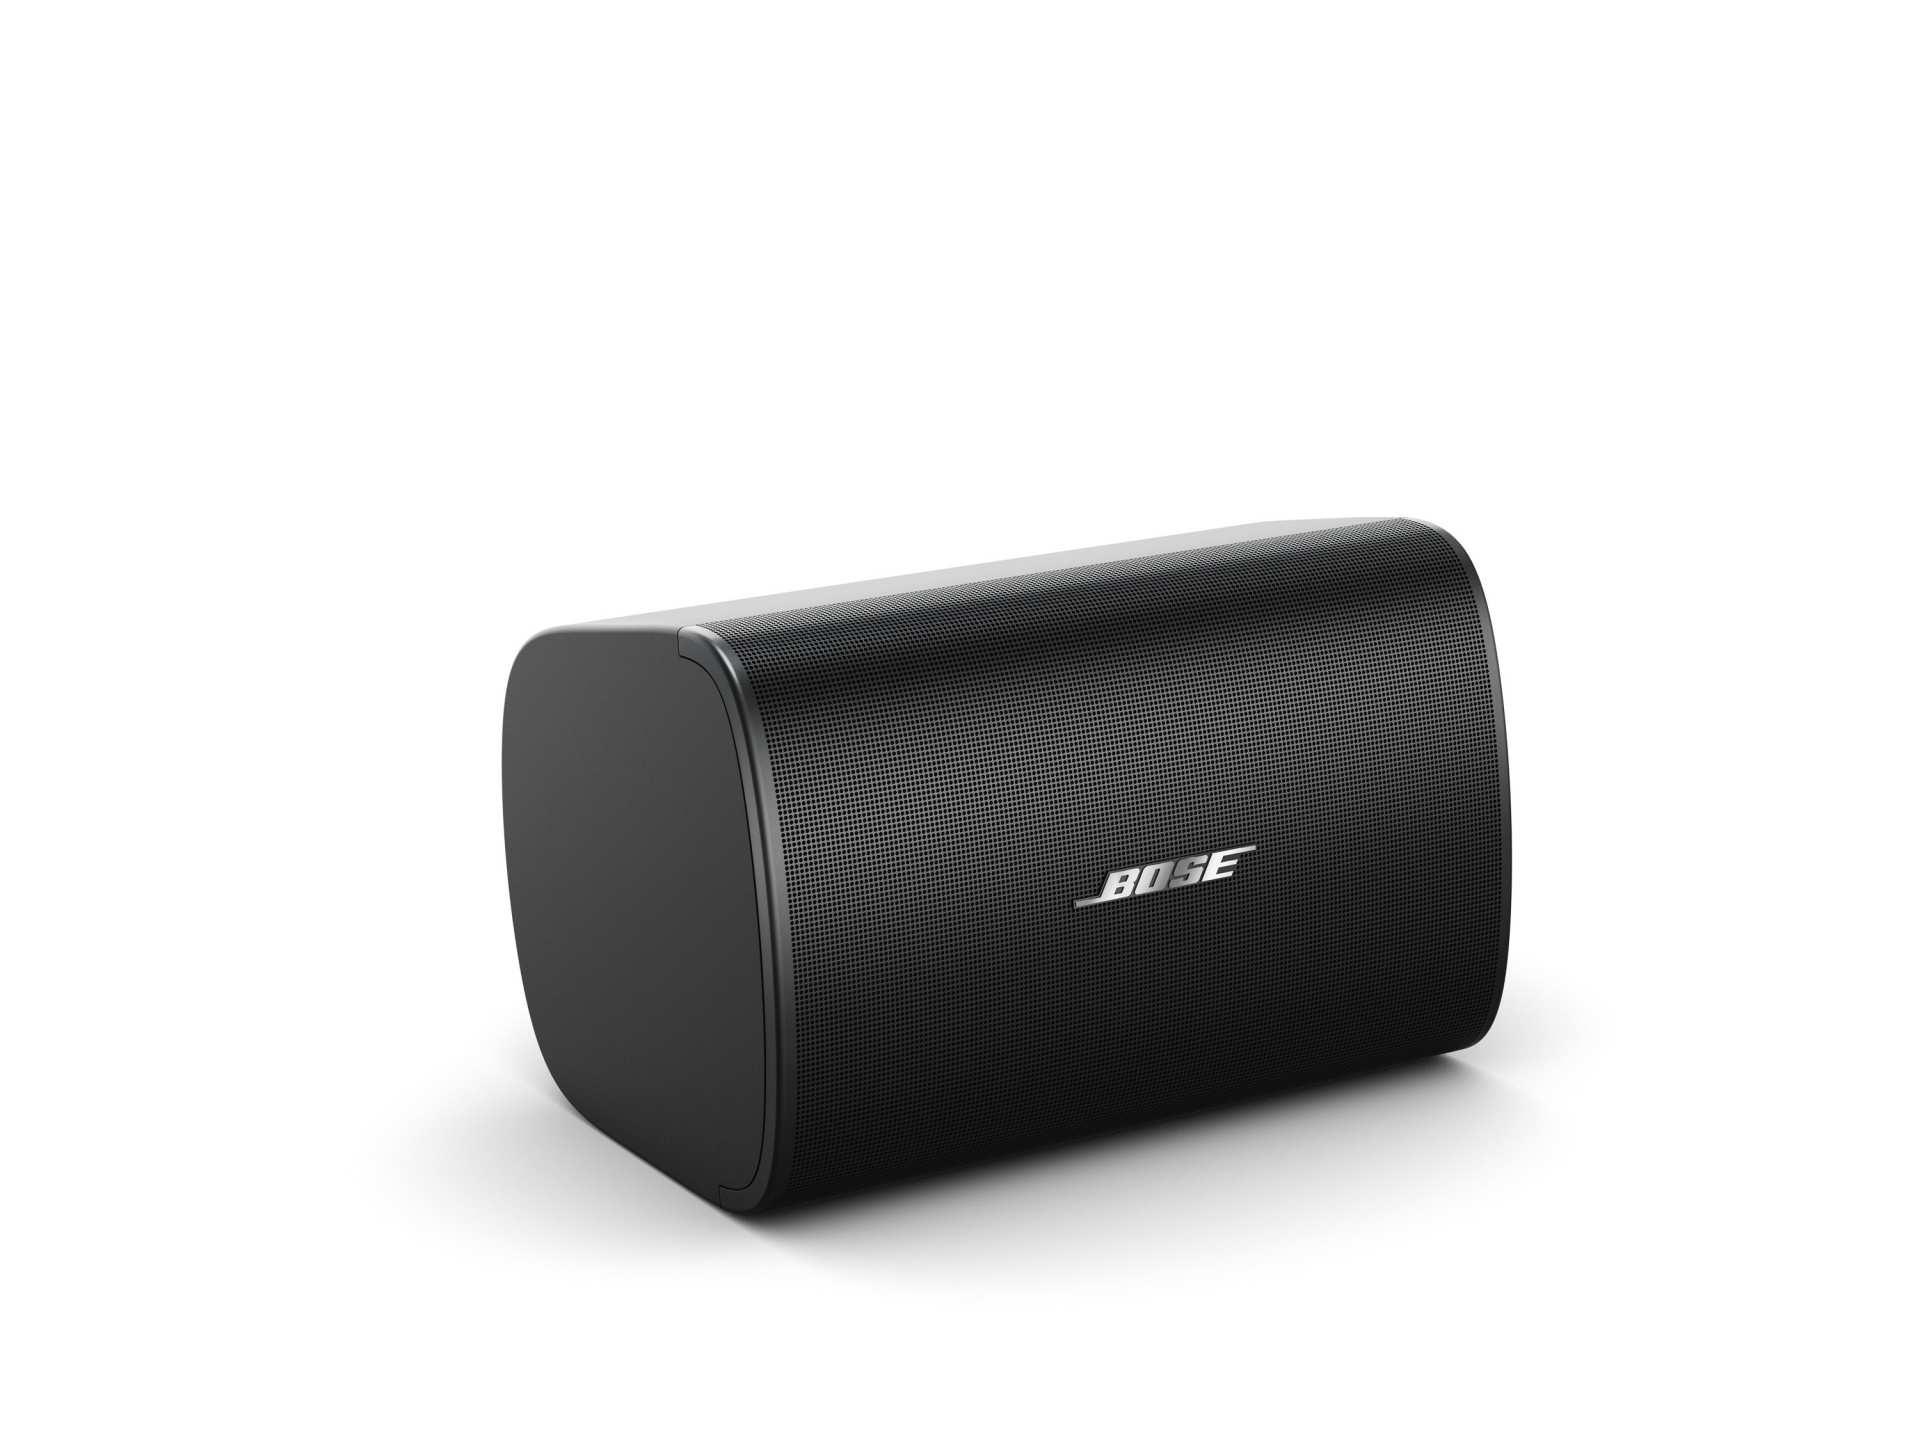 Bose DesignMax DM6SE czarny | Autoryzowany Dealer